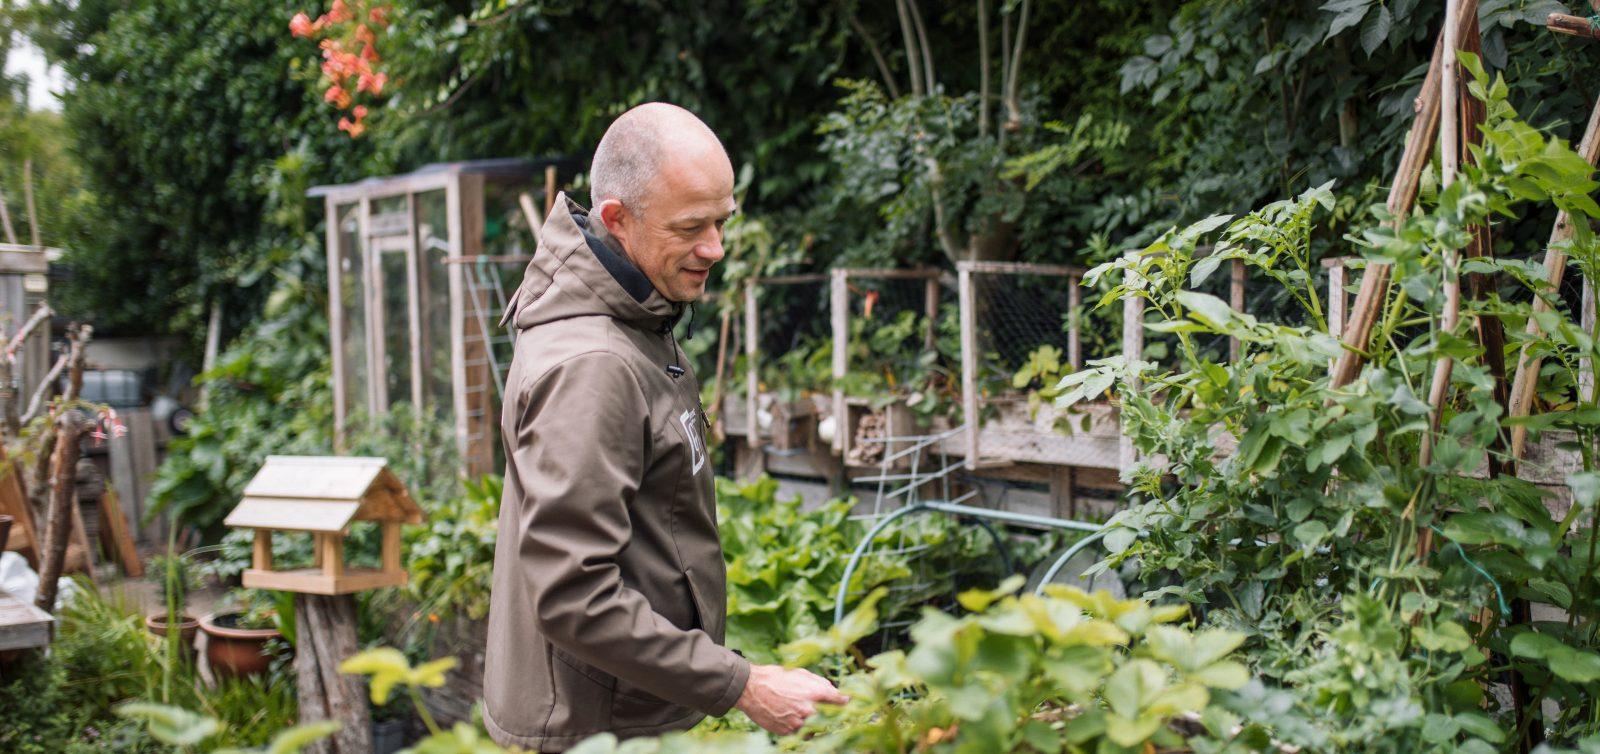 Gerard Tamminga in de tuin